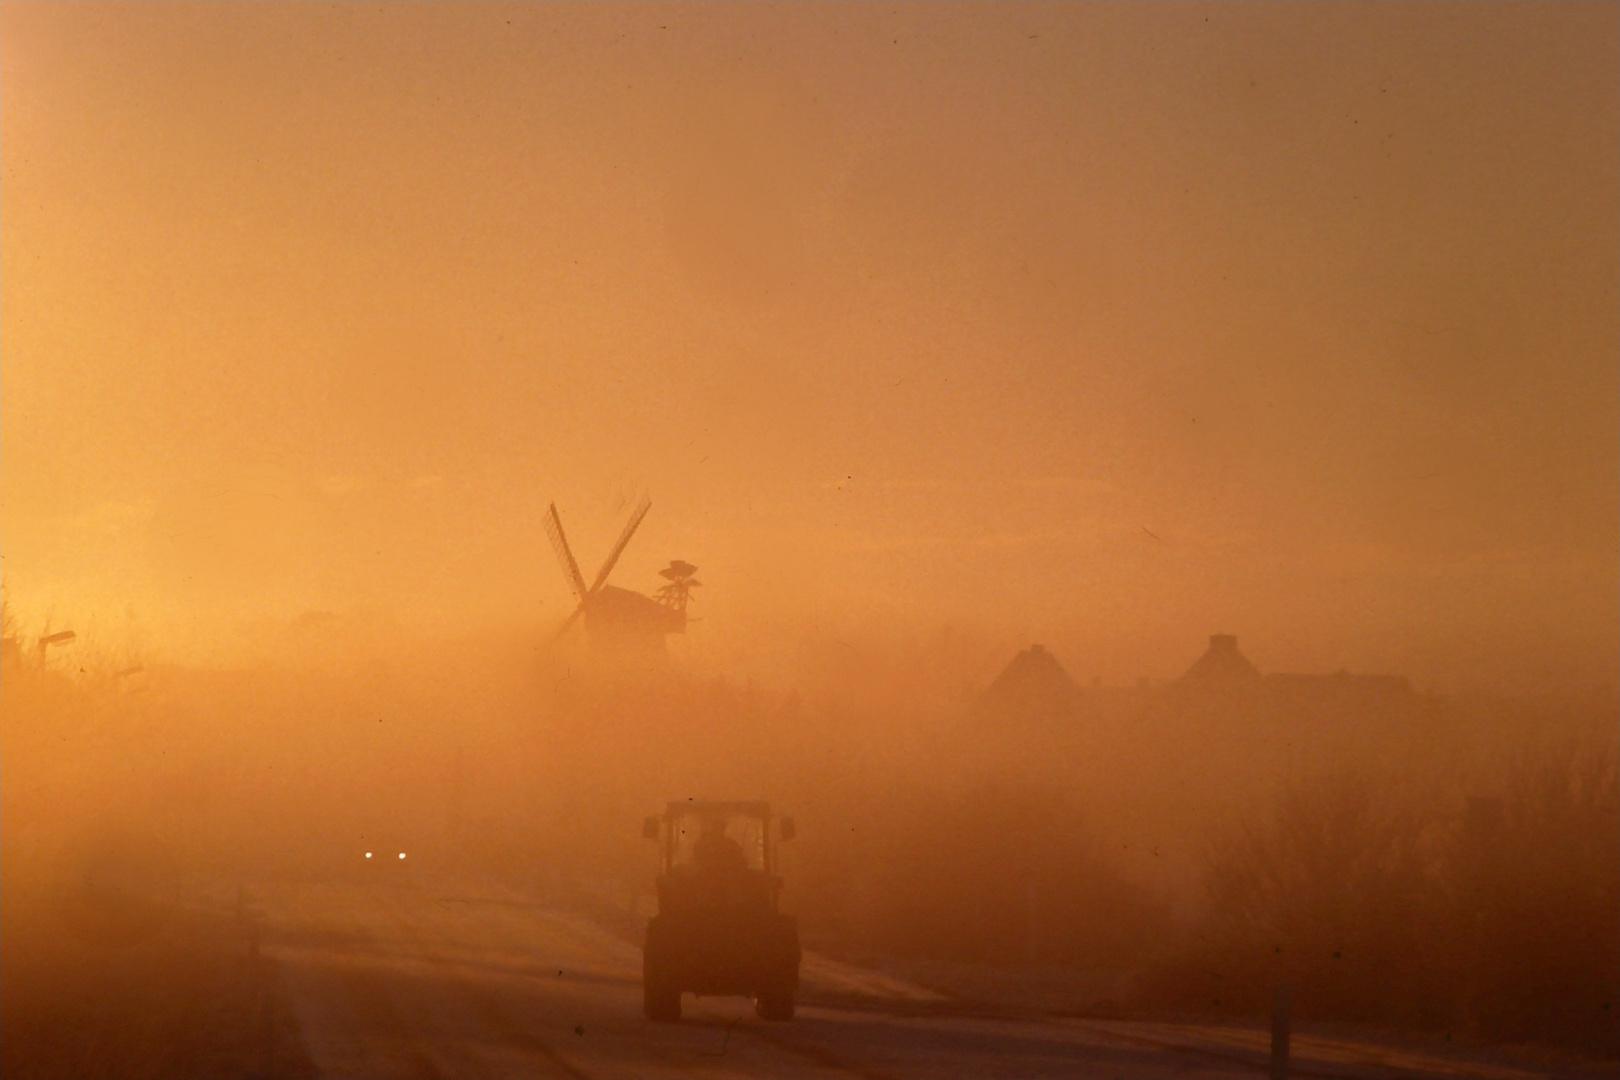 Sonne imNebel: Spätherbst in Föhr